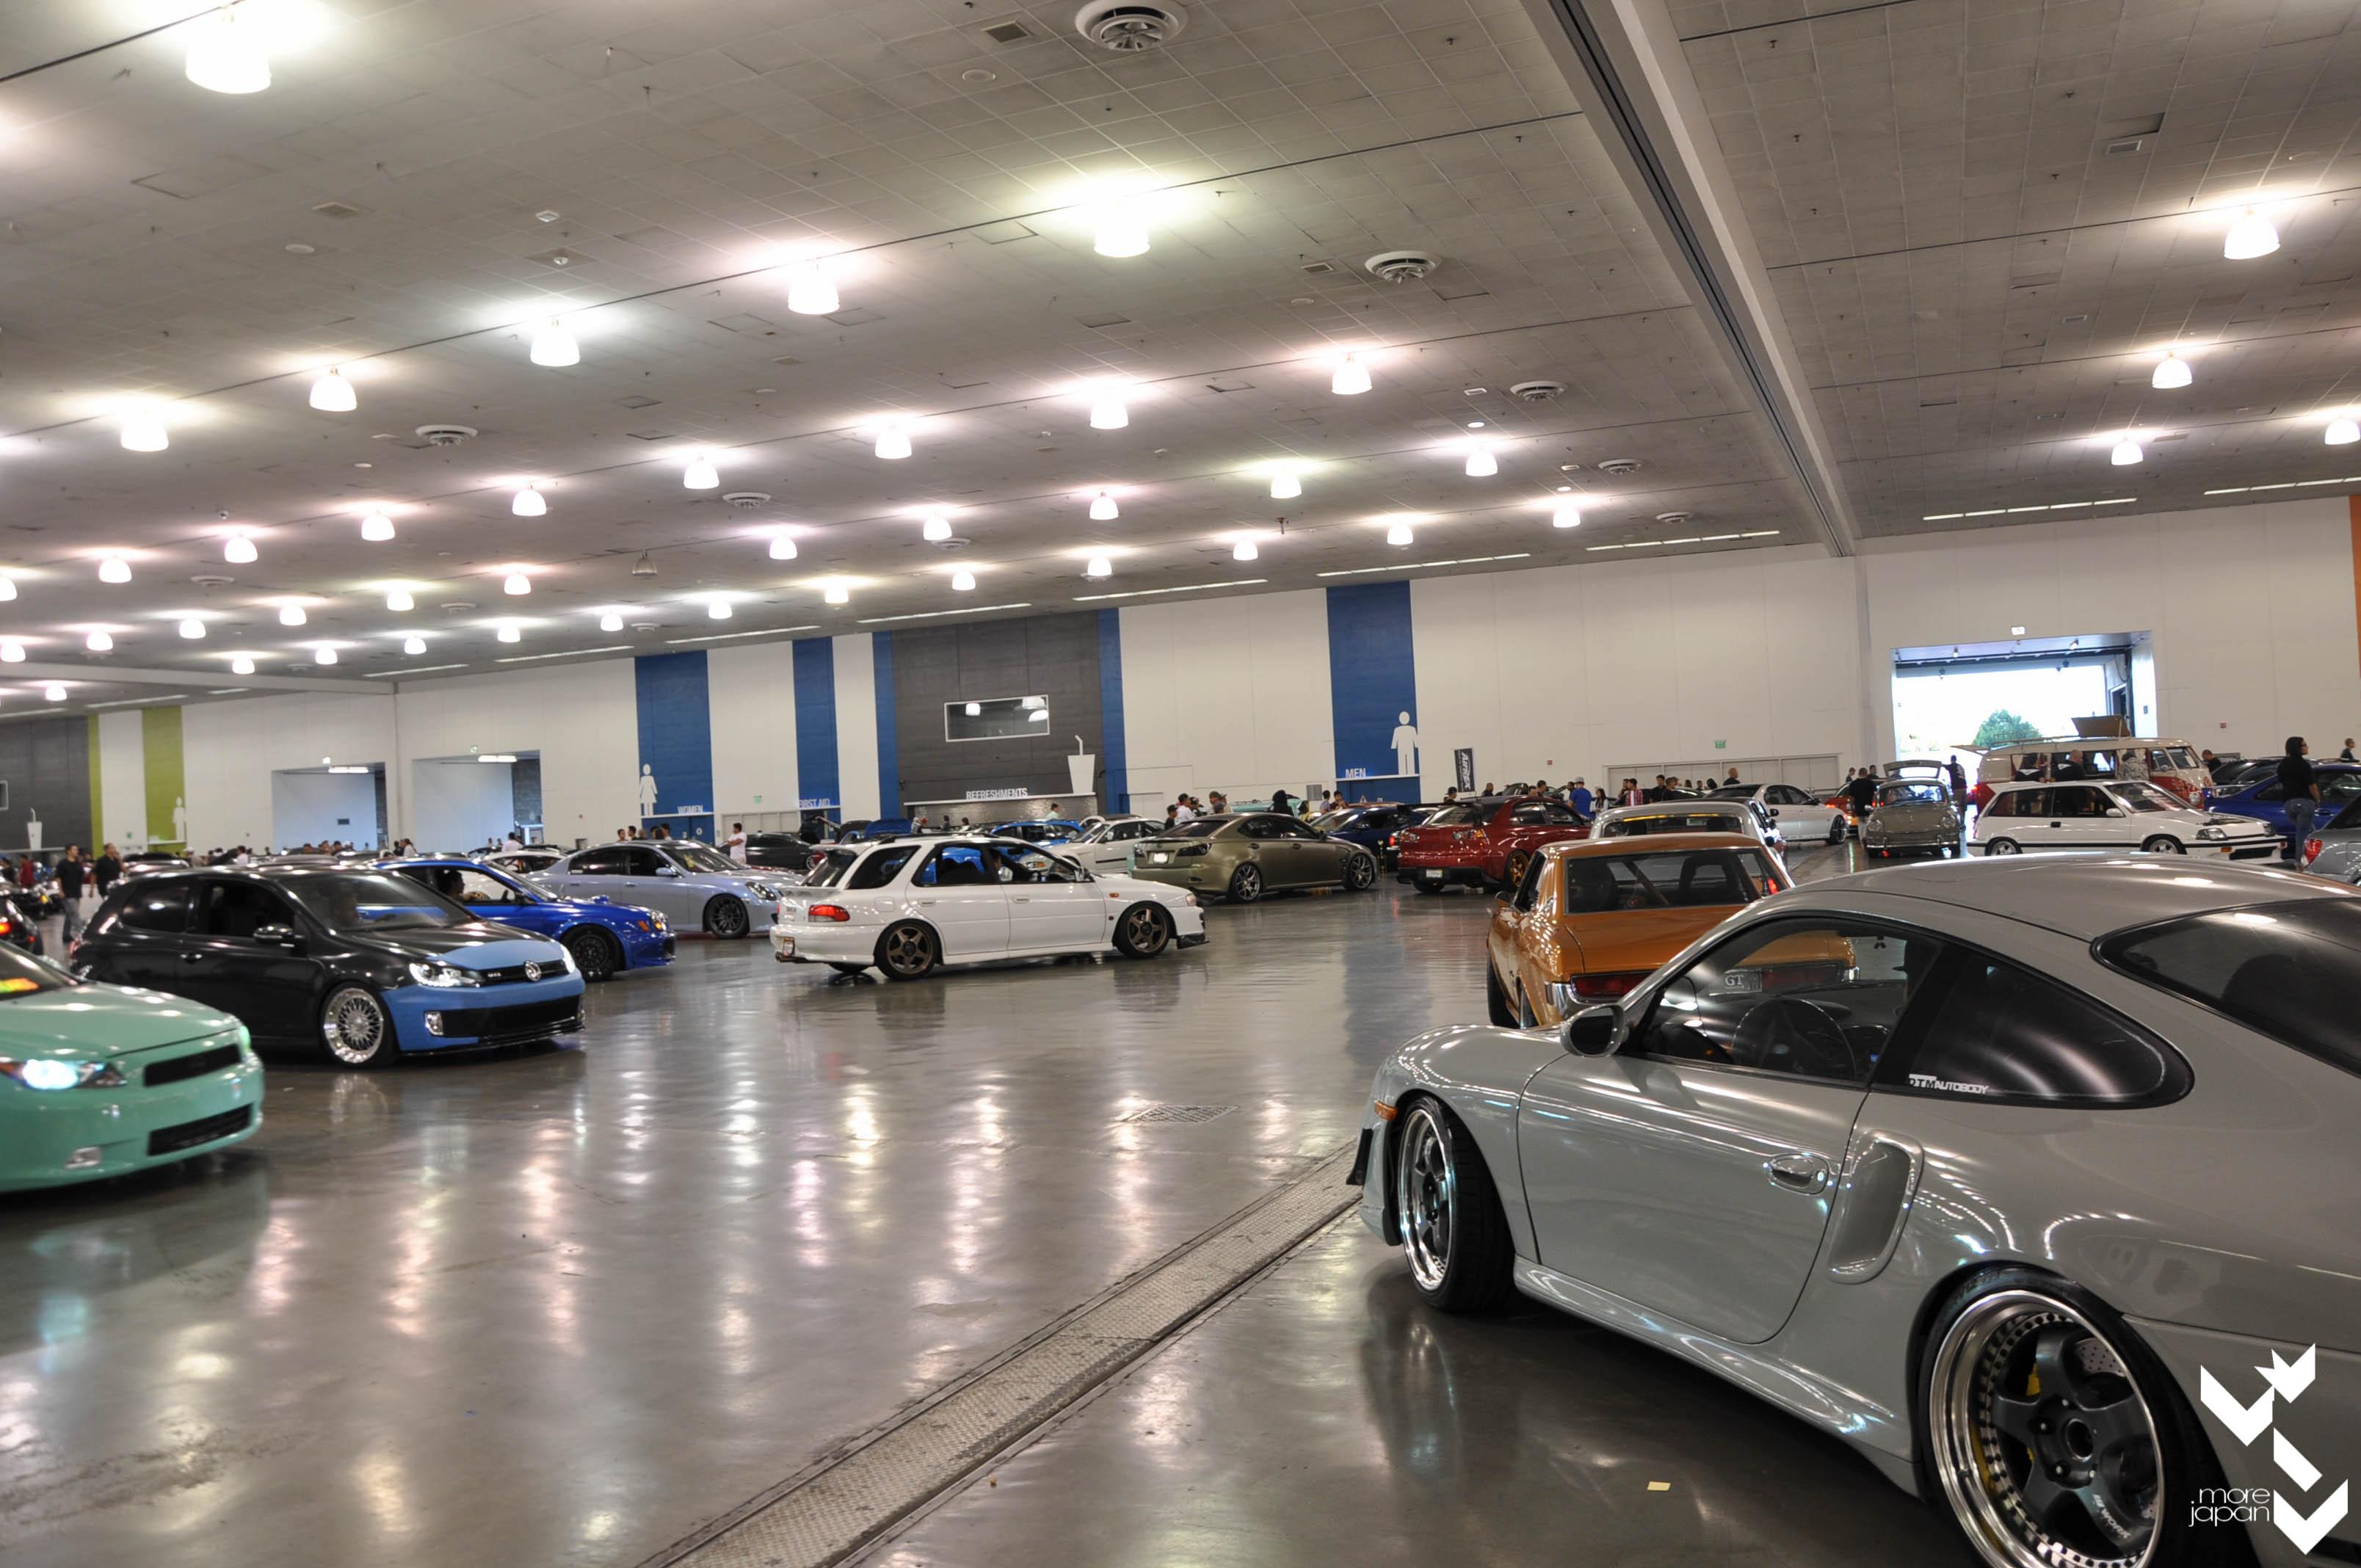 Cars from Wekfest San Jose 2014 More Japan Blog